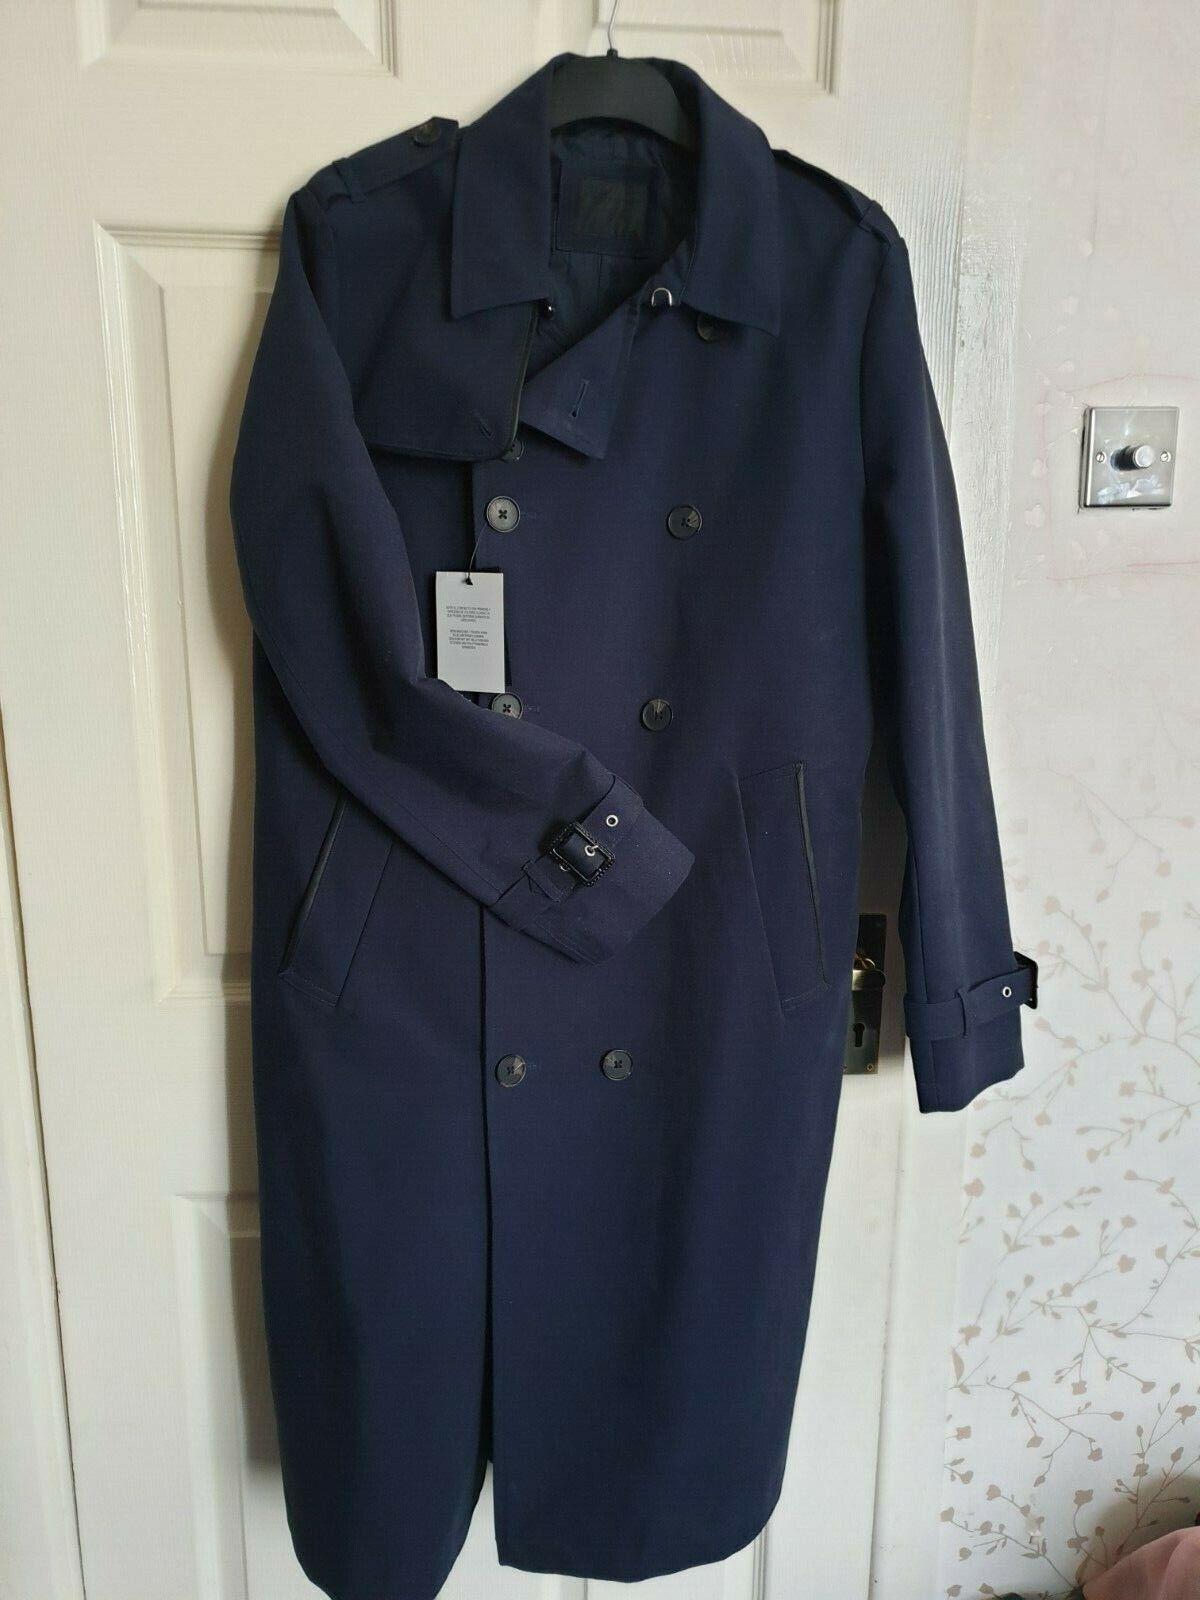 Asos Bleu Marine trench coat, taille moyenne, BNWT, livraison gratuite